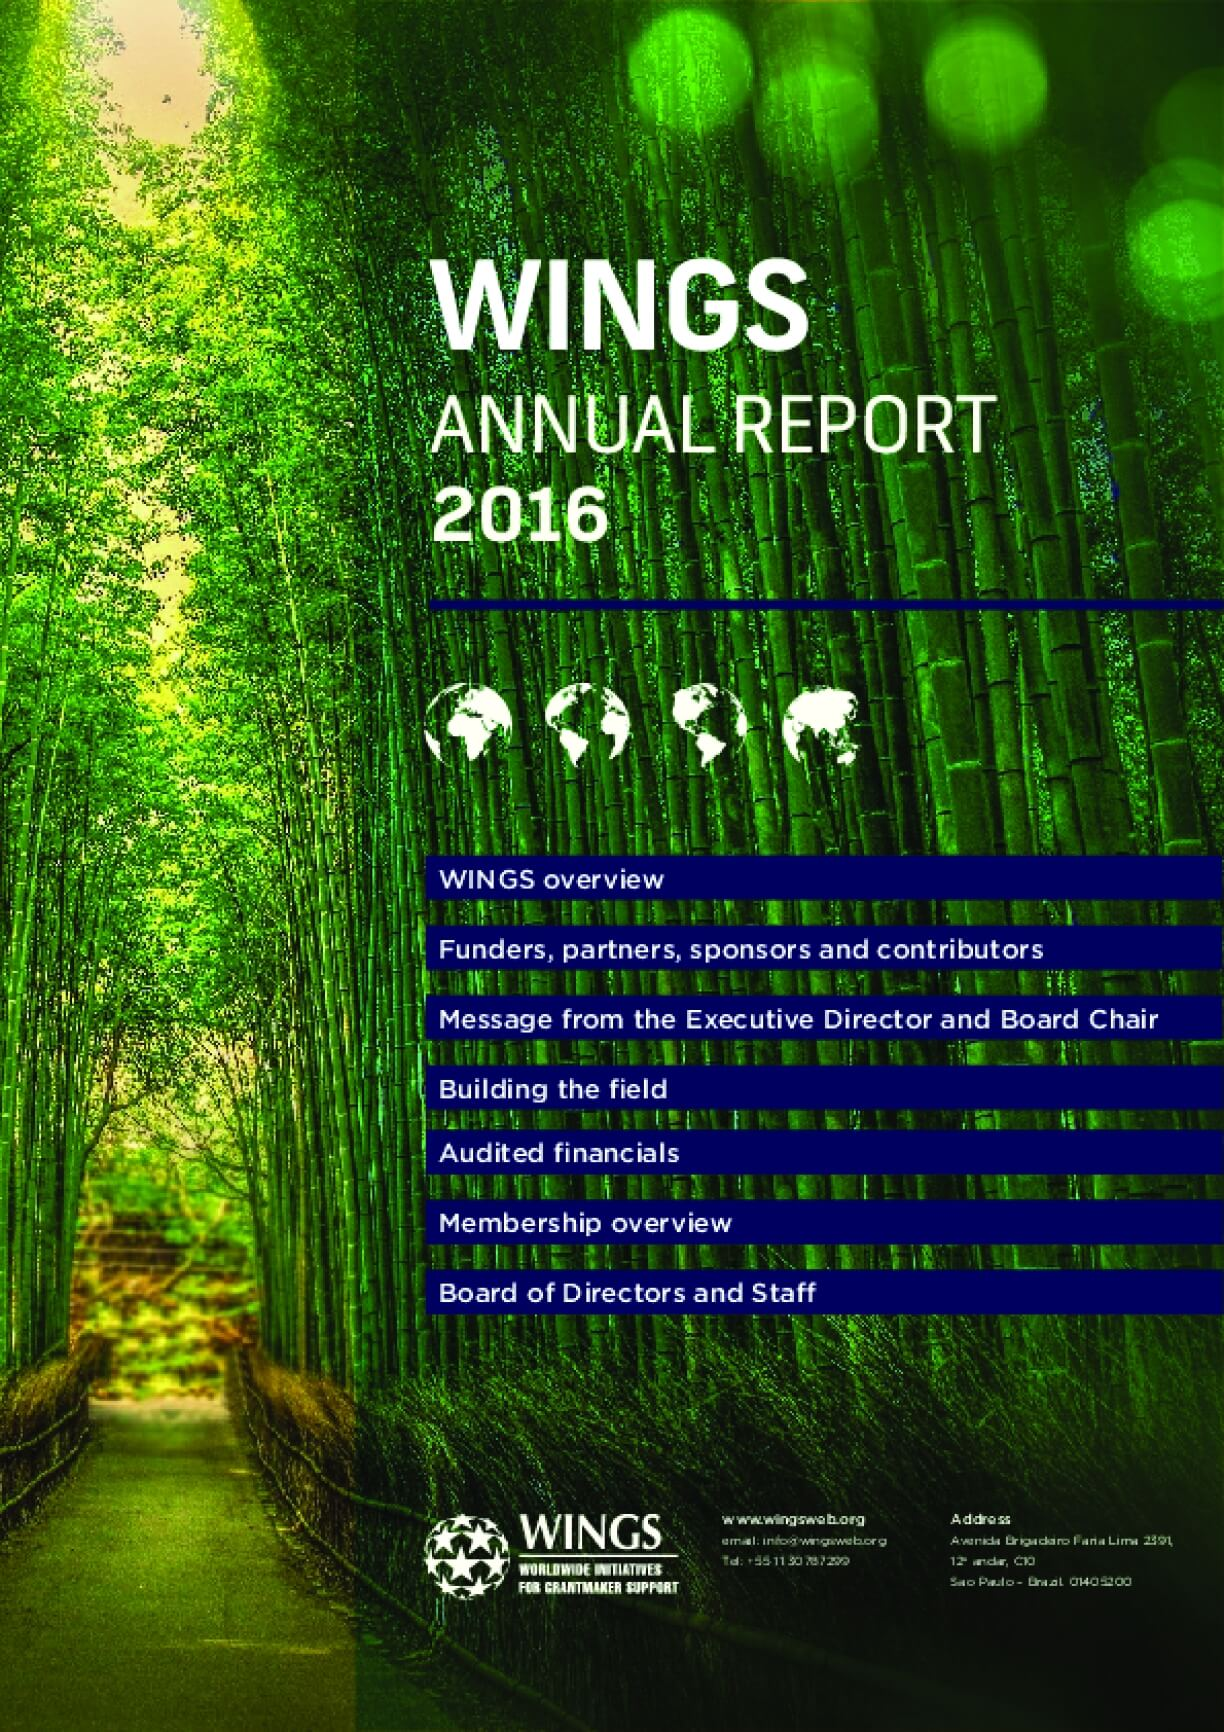 WINGS Annual Report 2016